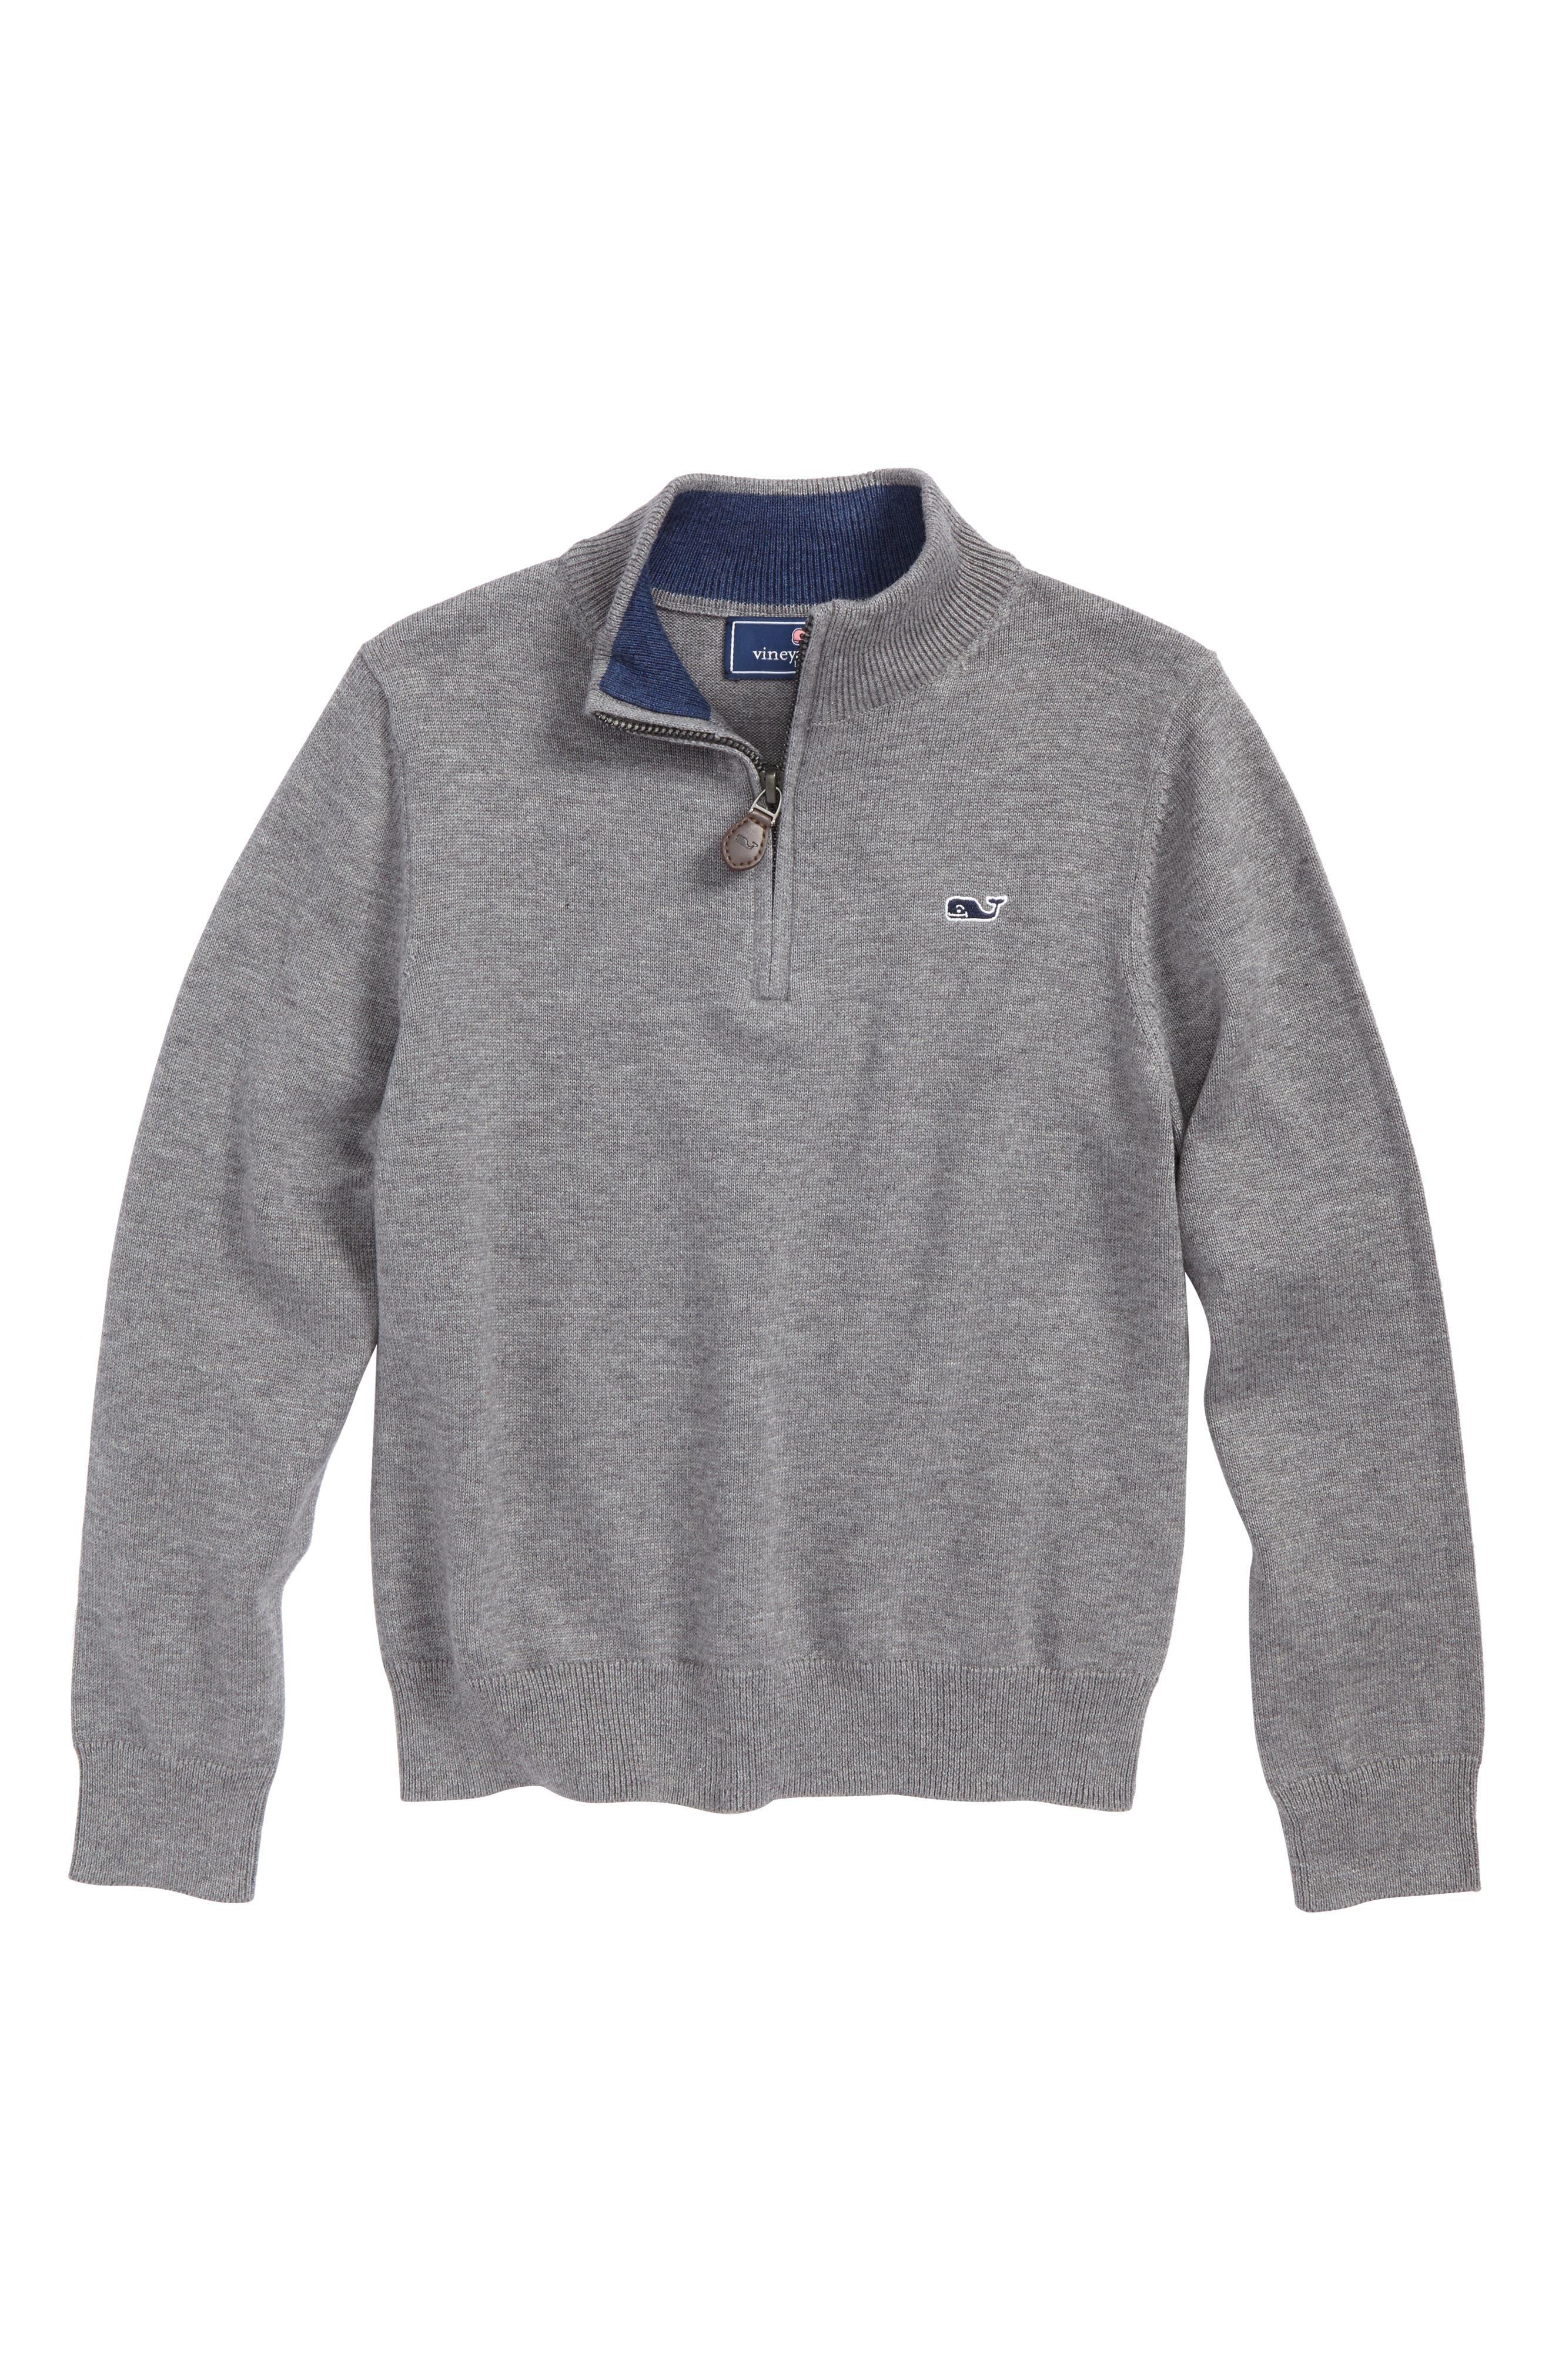 Classic Quarter Zip Sweater,                             Main thumbnail 1, color,                             030